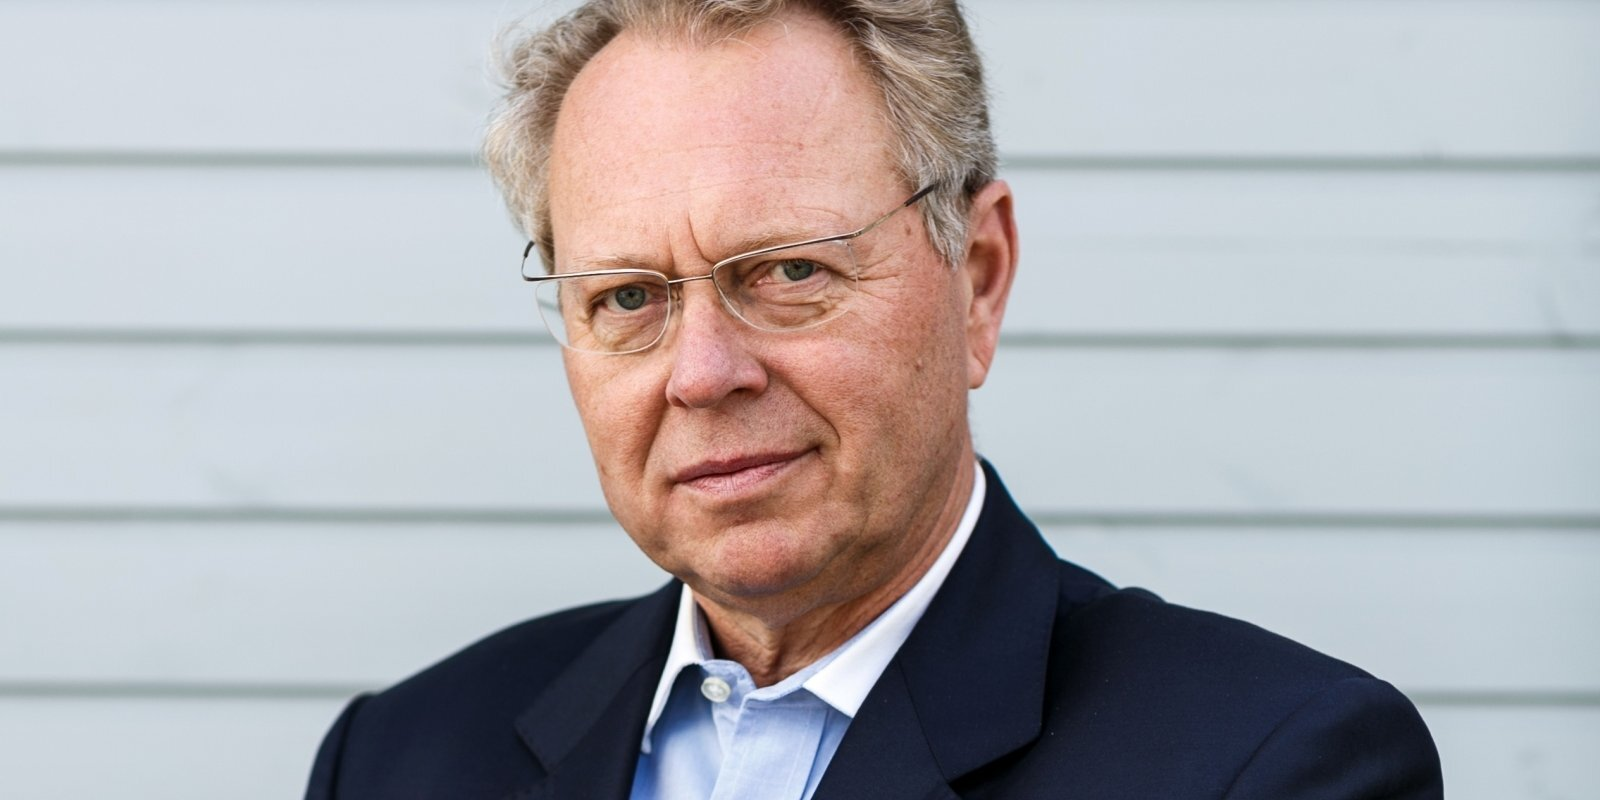 Personība biznesā: 'LMT' prezidents Juris Binde